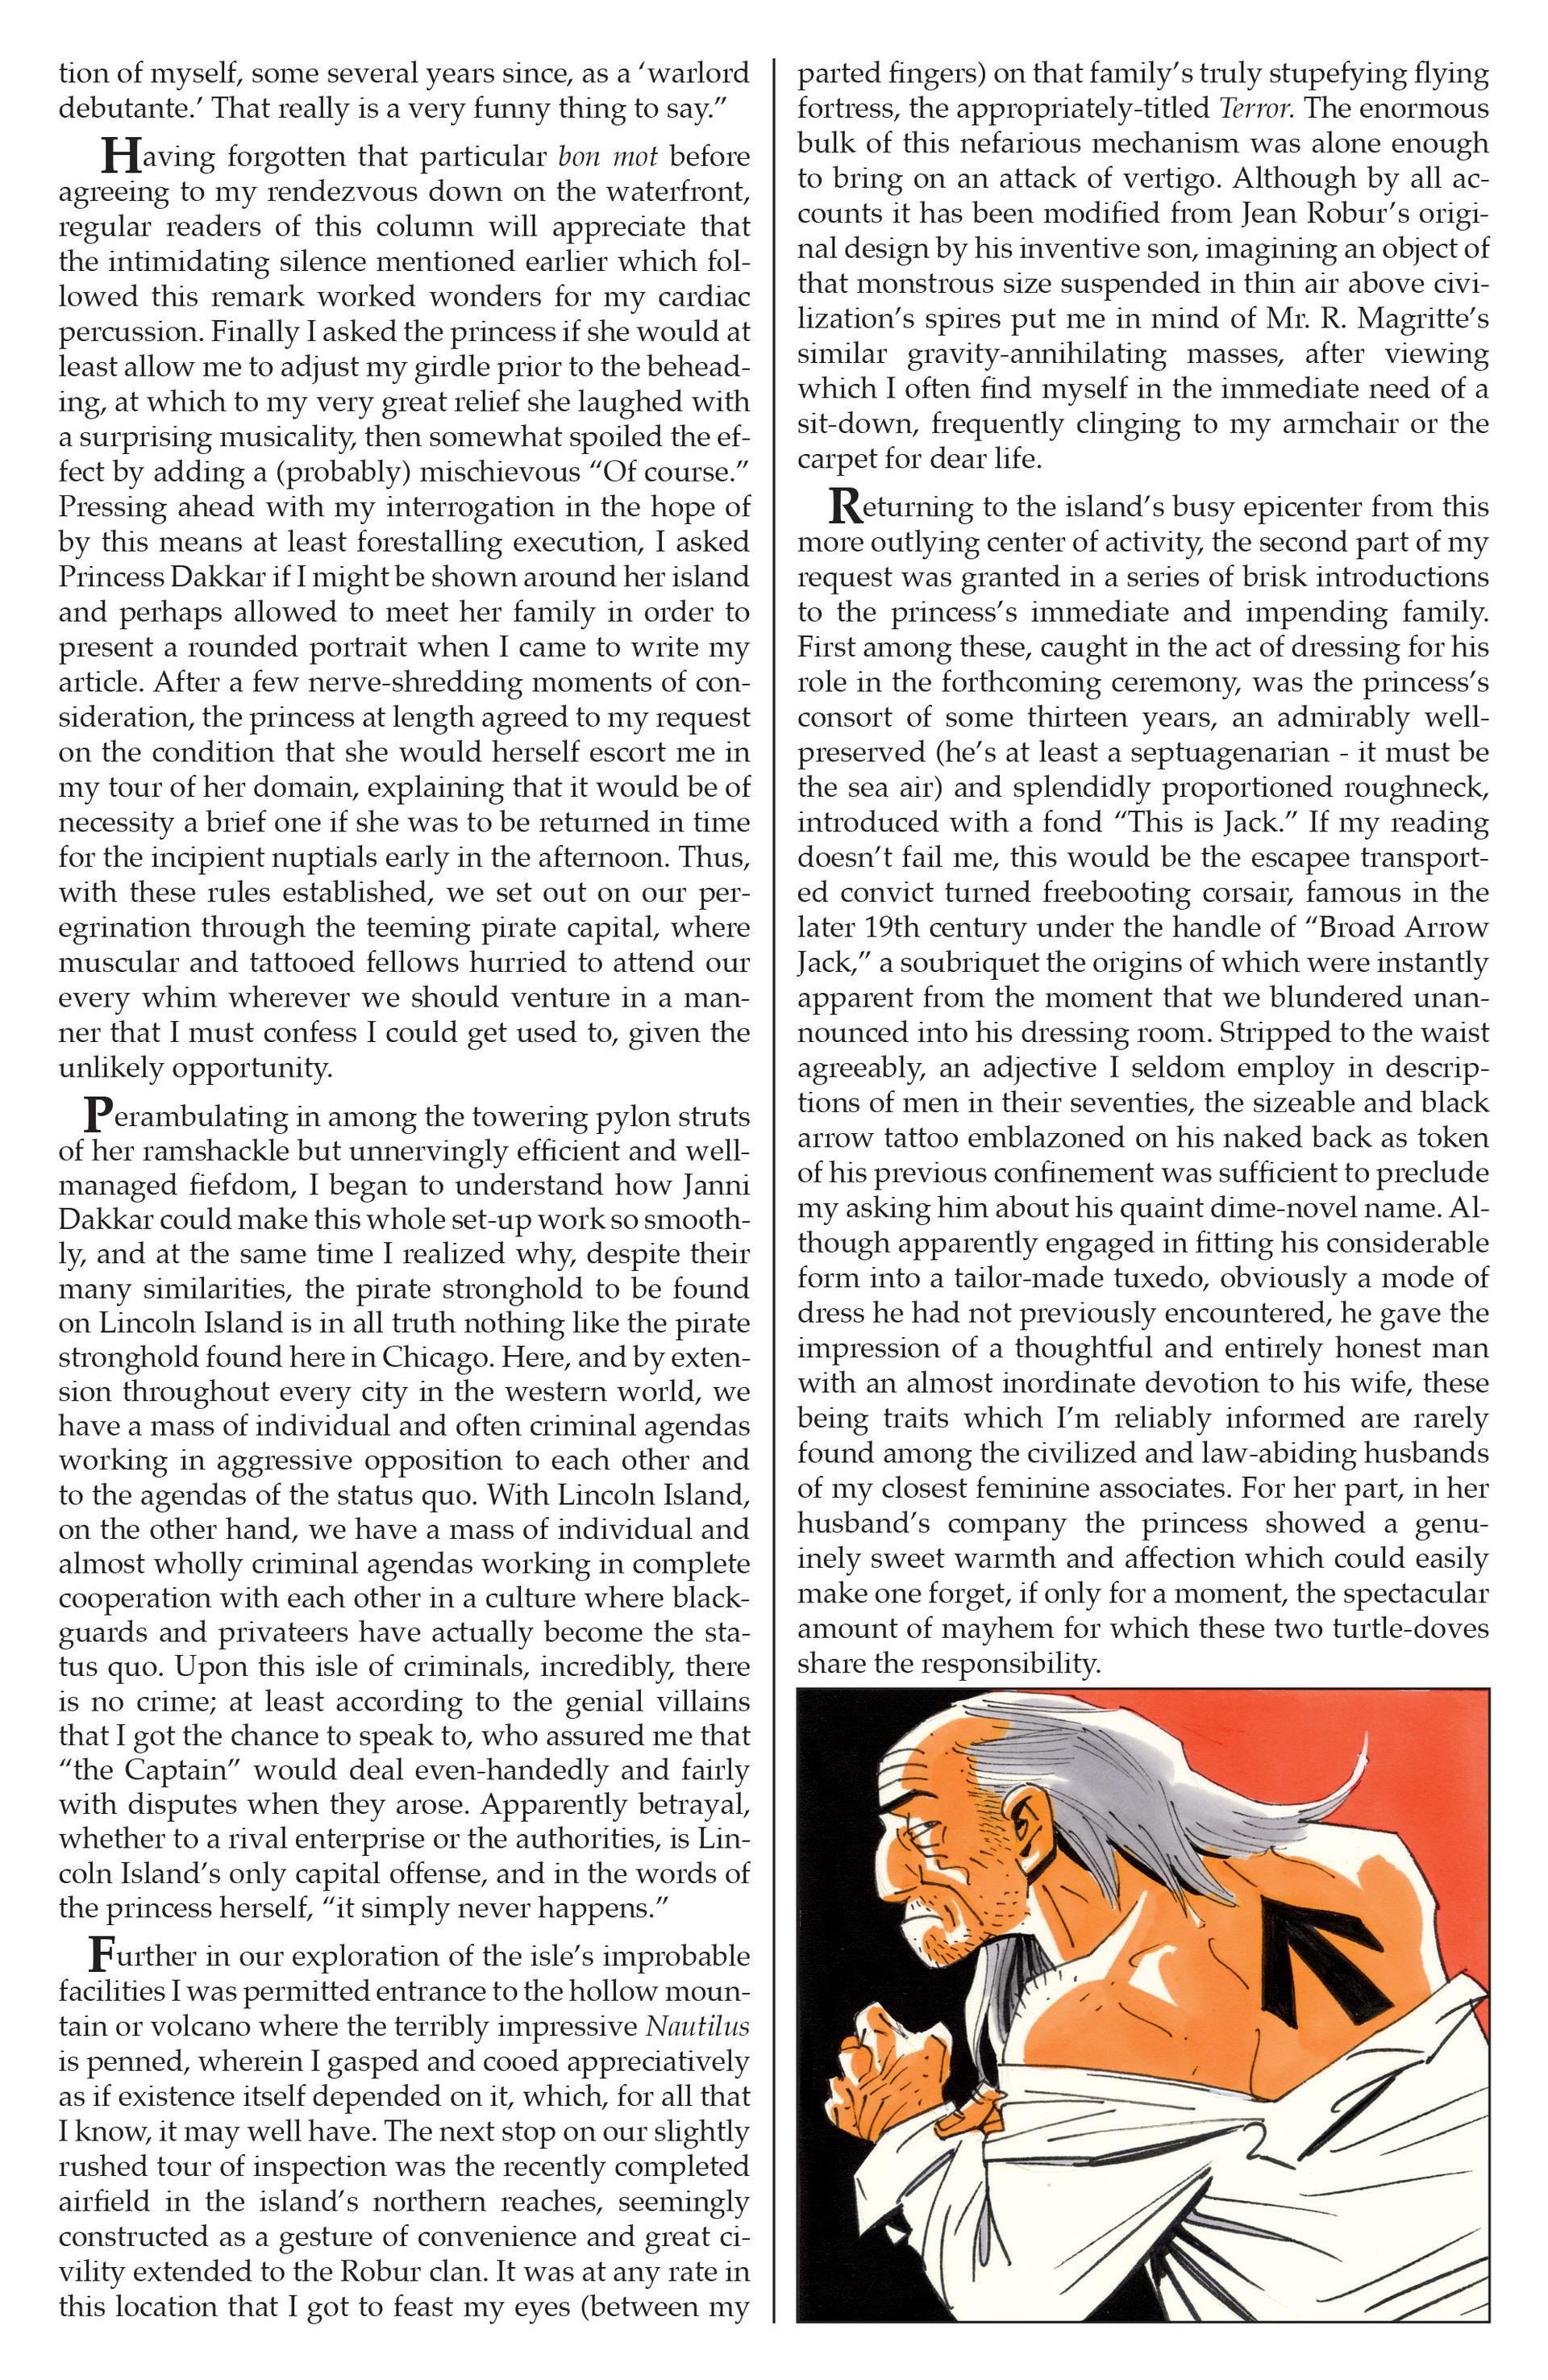 Read online Nemo: Heart of Ice comic -  Issue # Full - 52